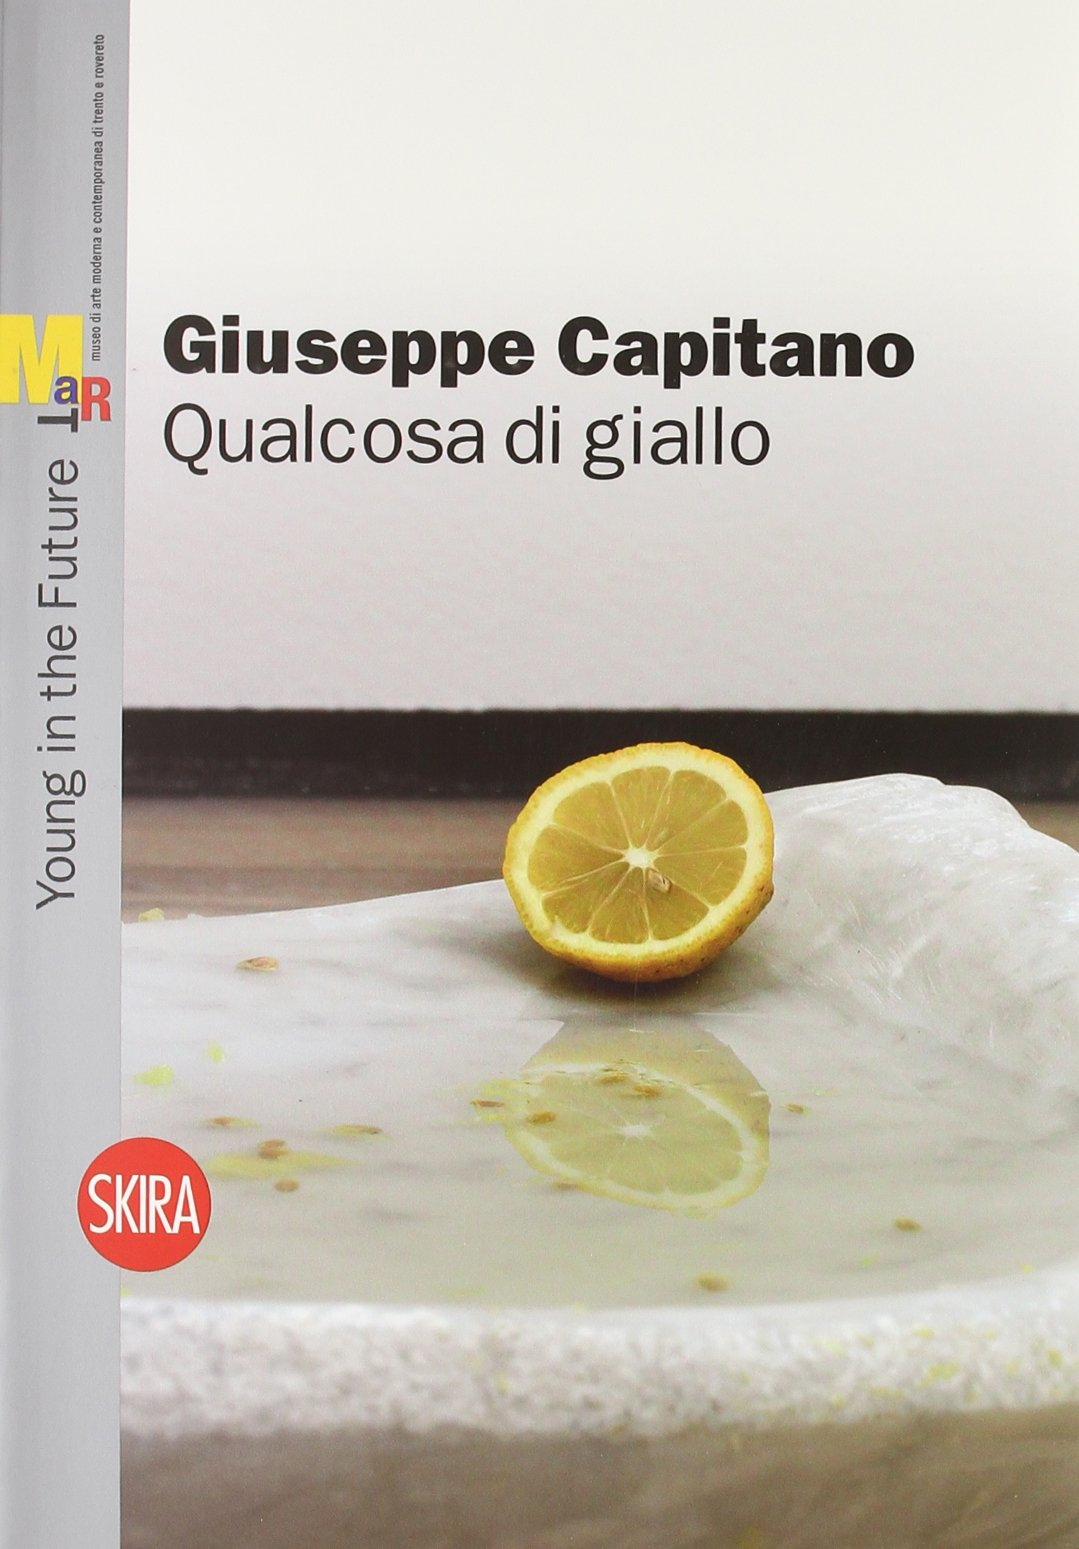 Giuseppe Capitano